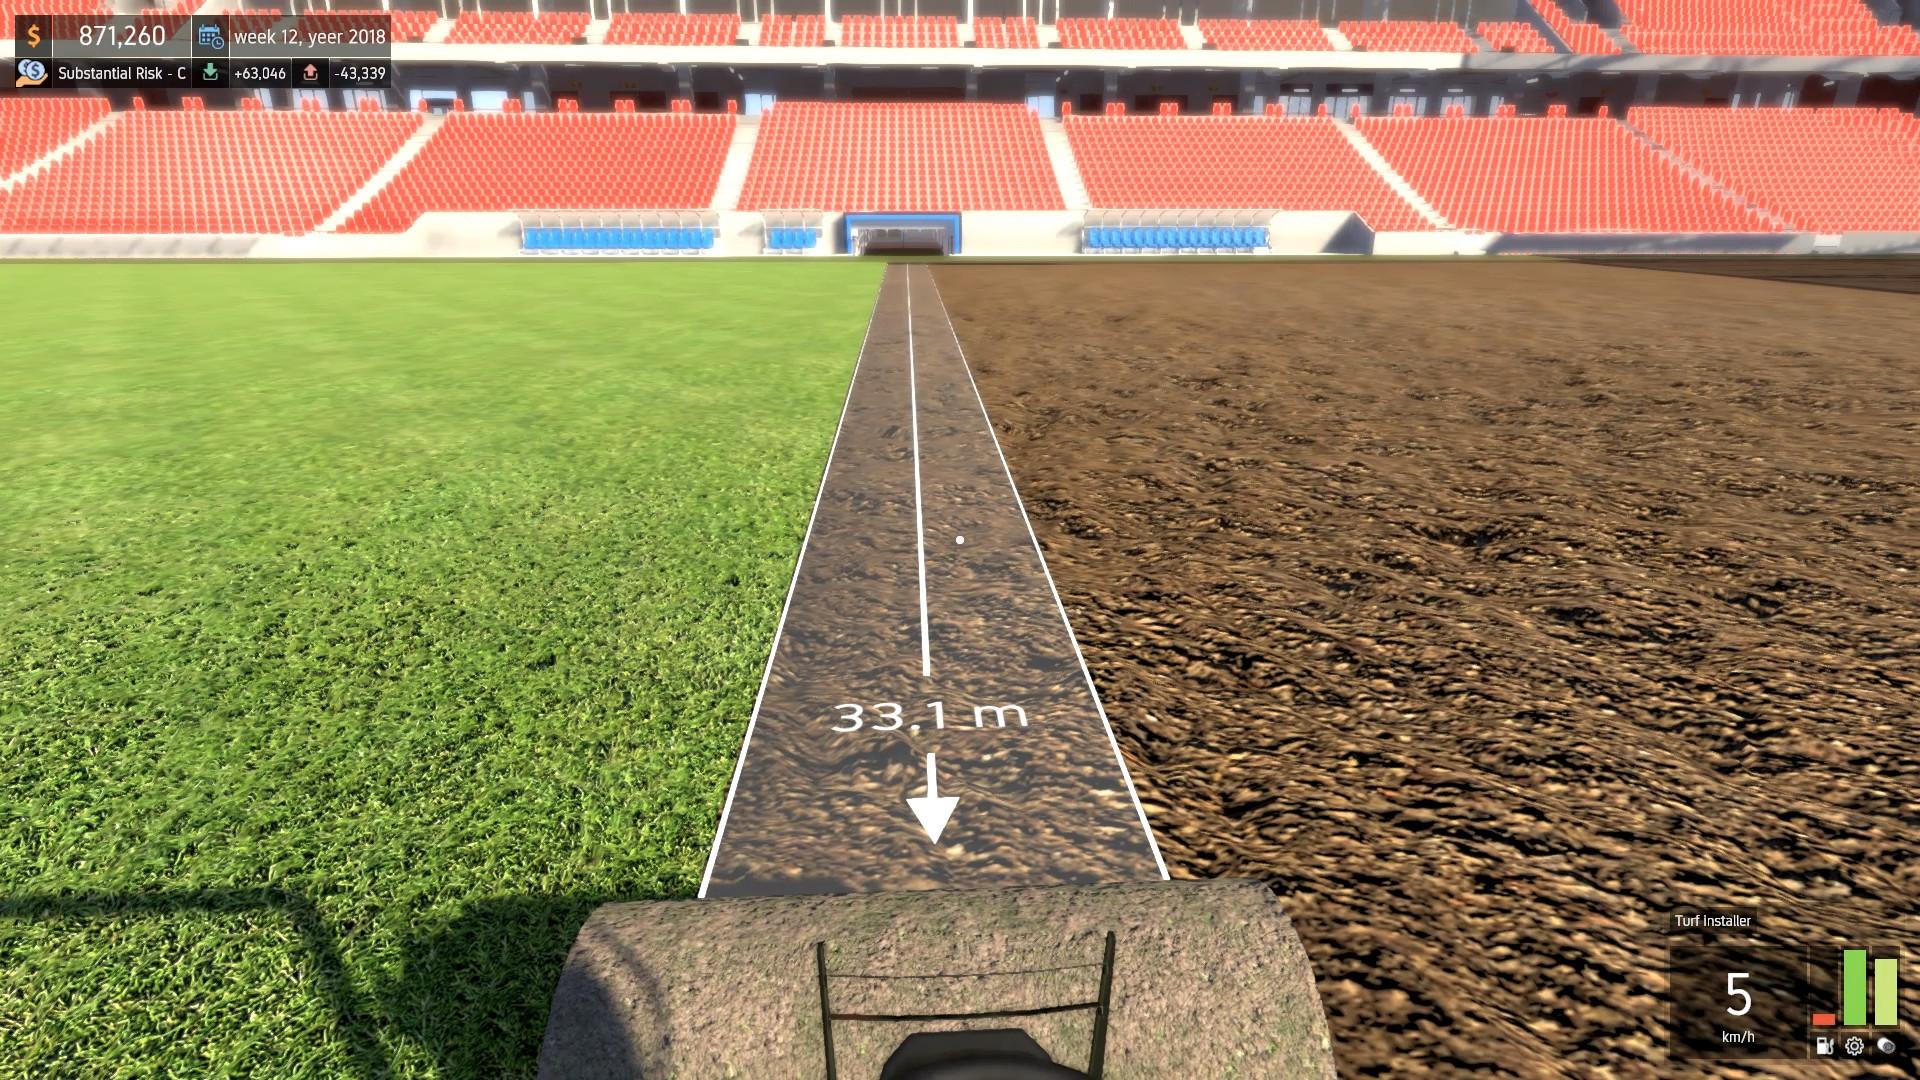 Make your own stadium game